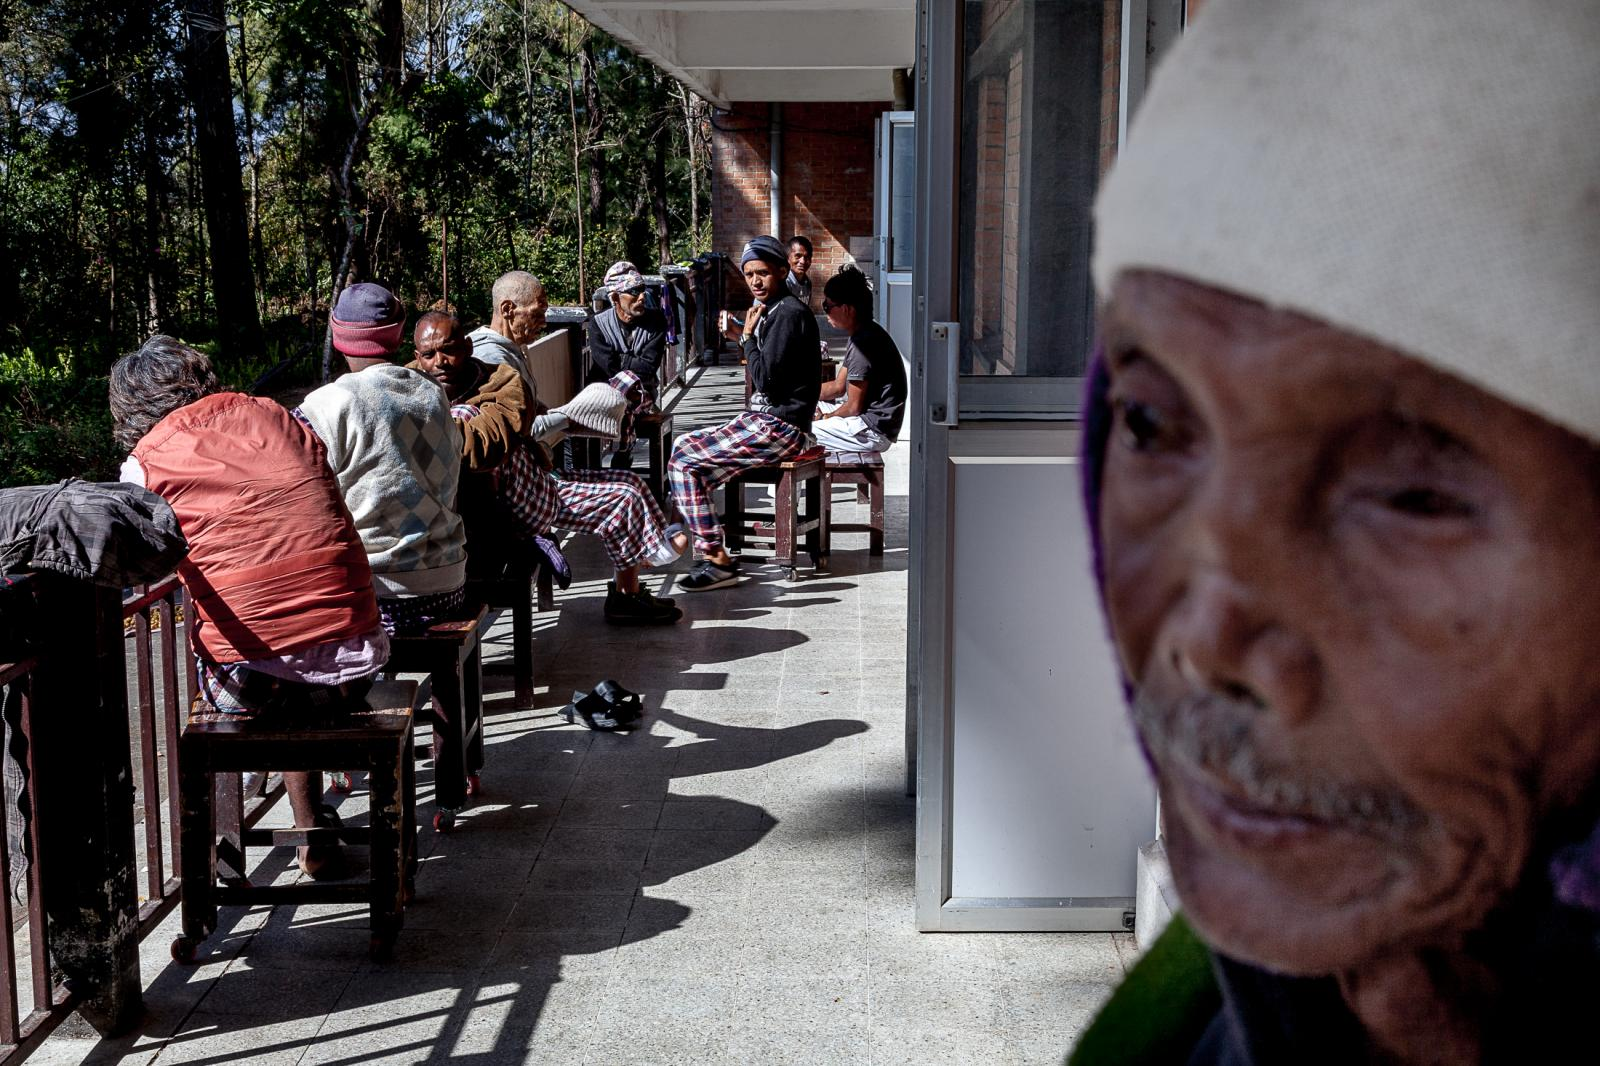 Photography image - Loading 001_Leprosy-Nepal-Omar-Havana.jpg